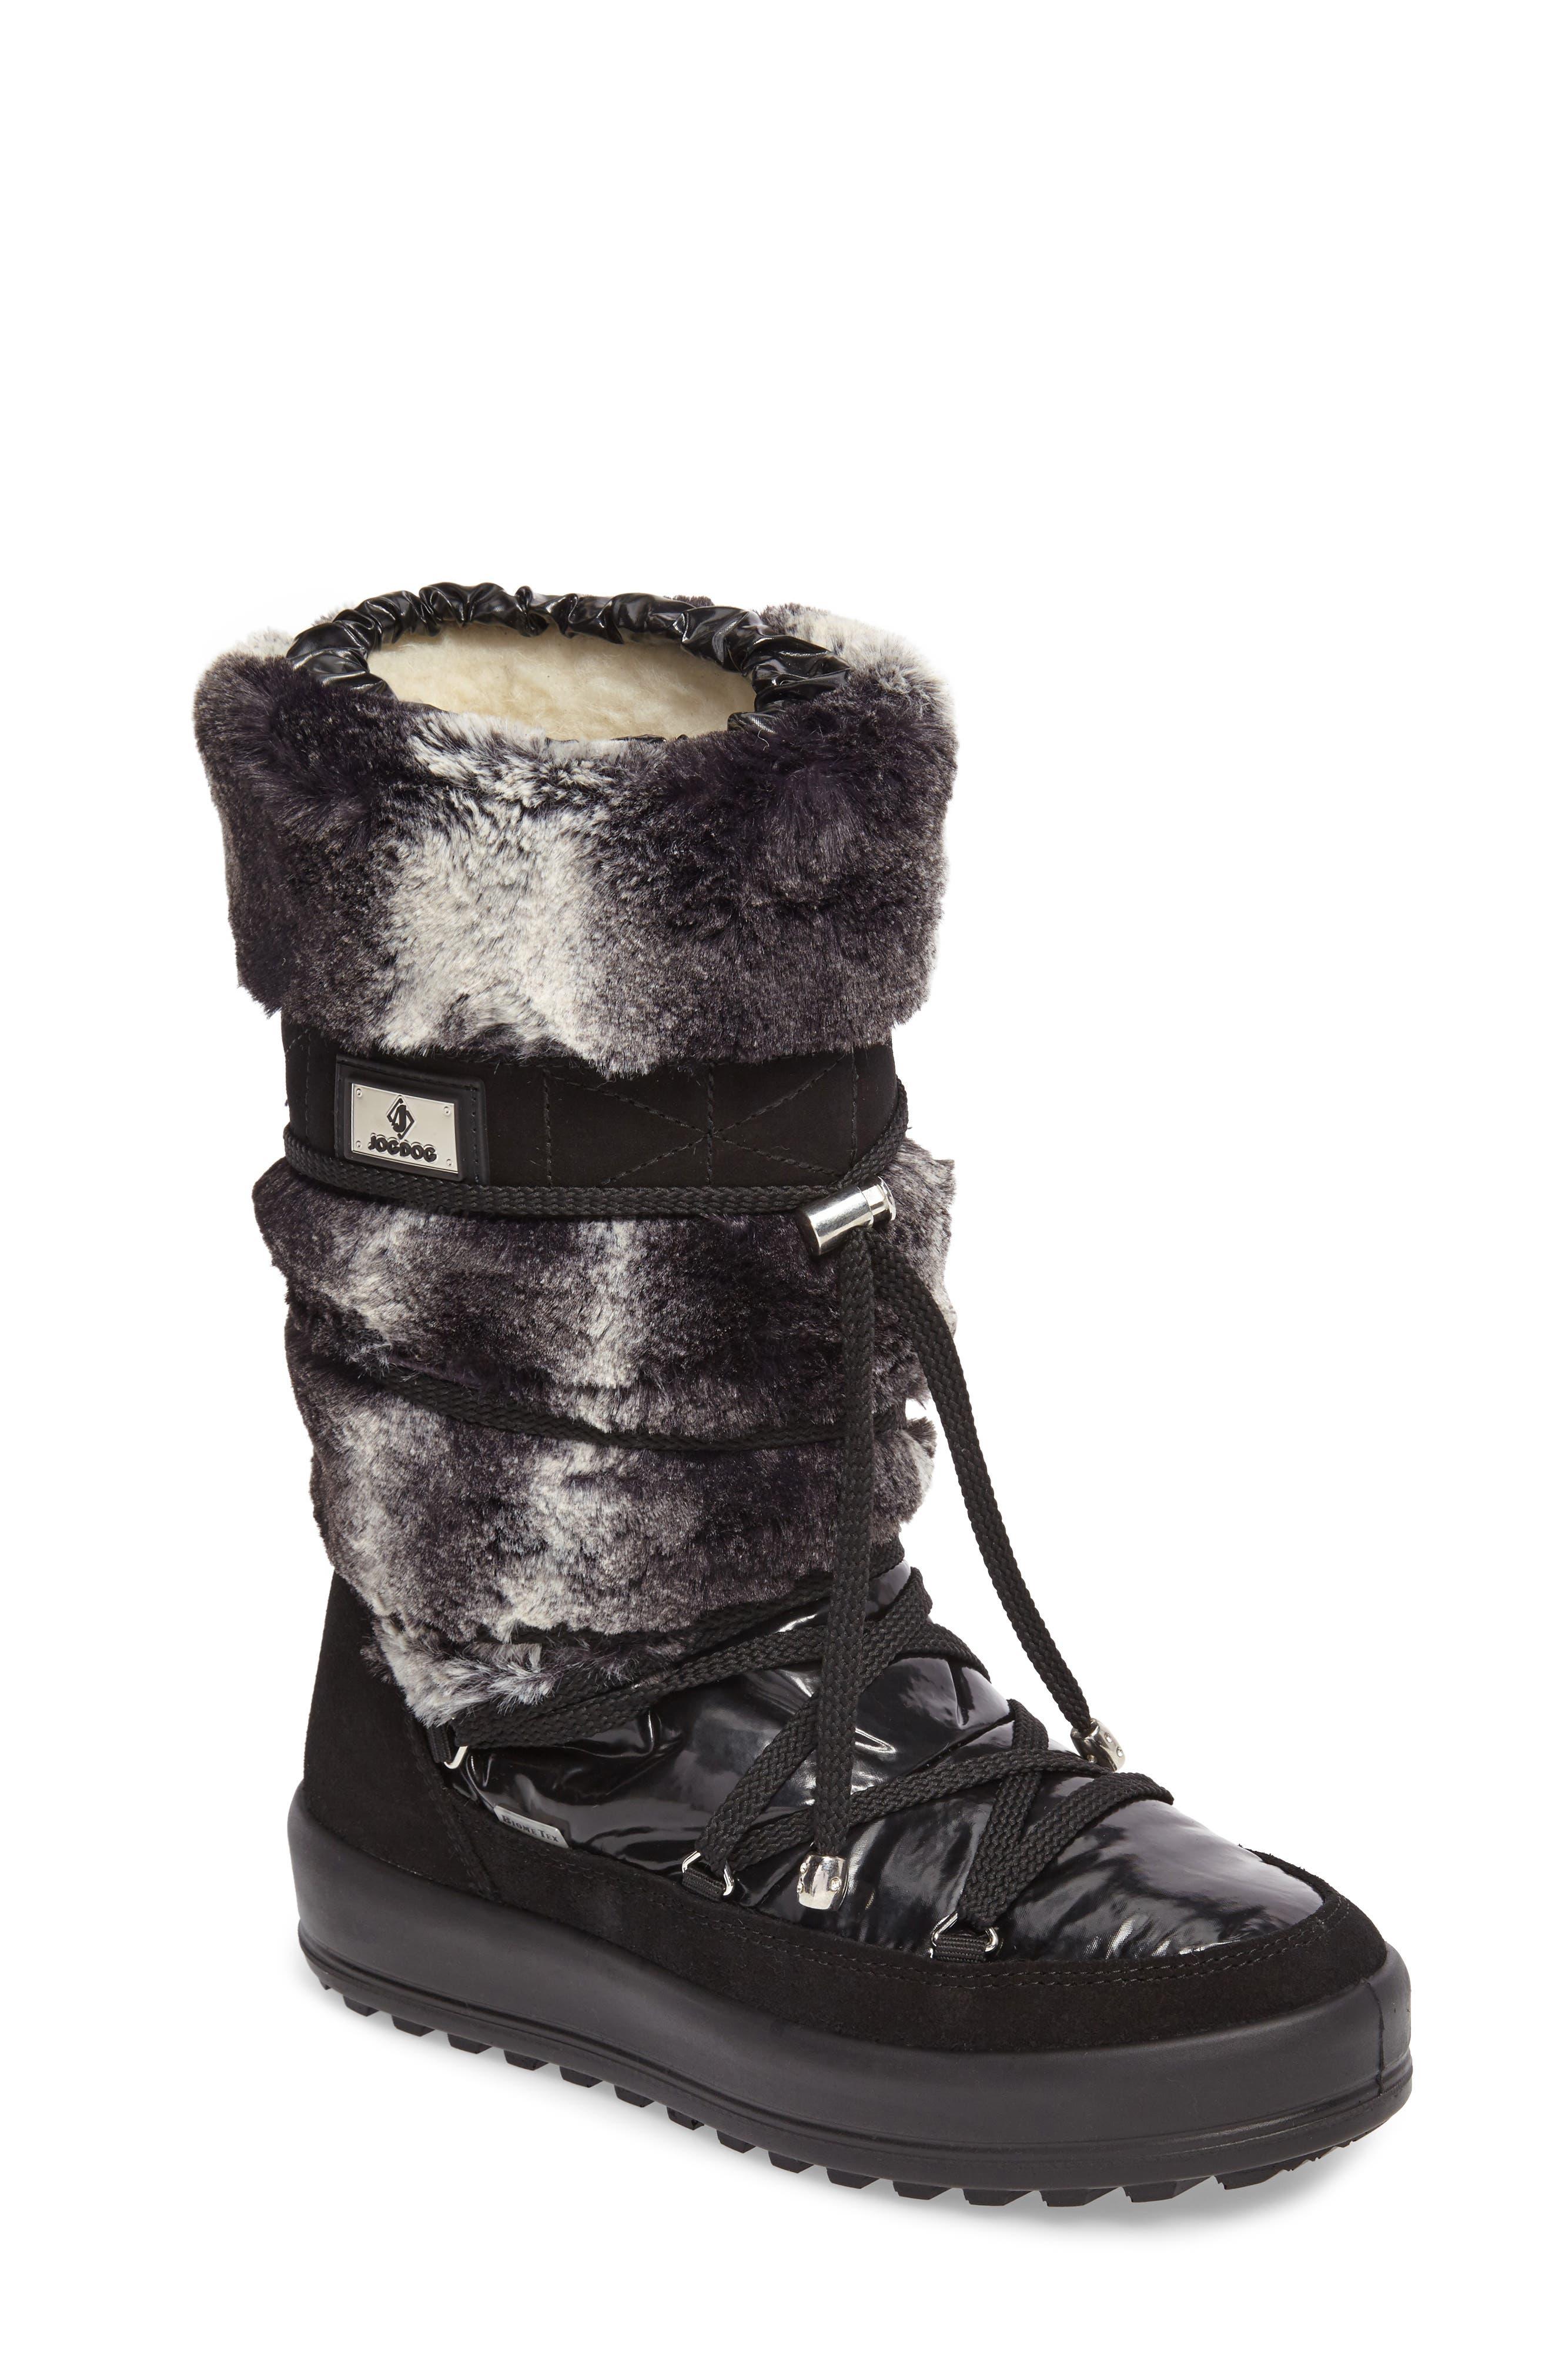 JOG DOG Kitzbuhel Faux Fur Waterproof Quilted Boot (Women)